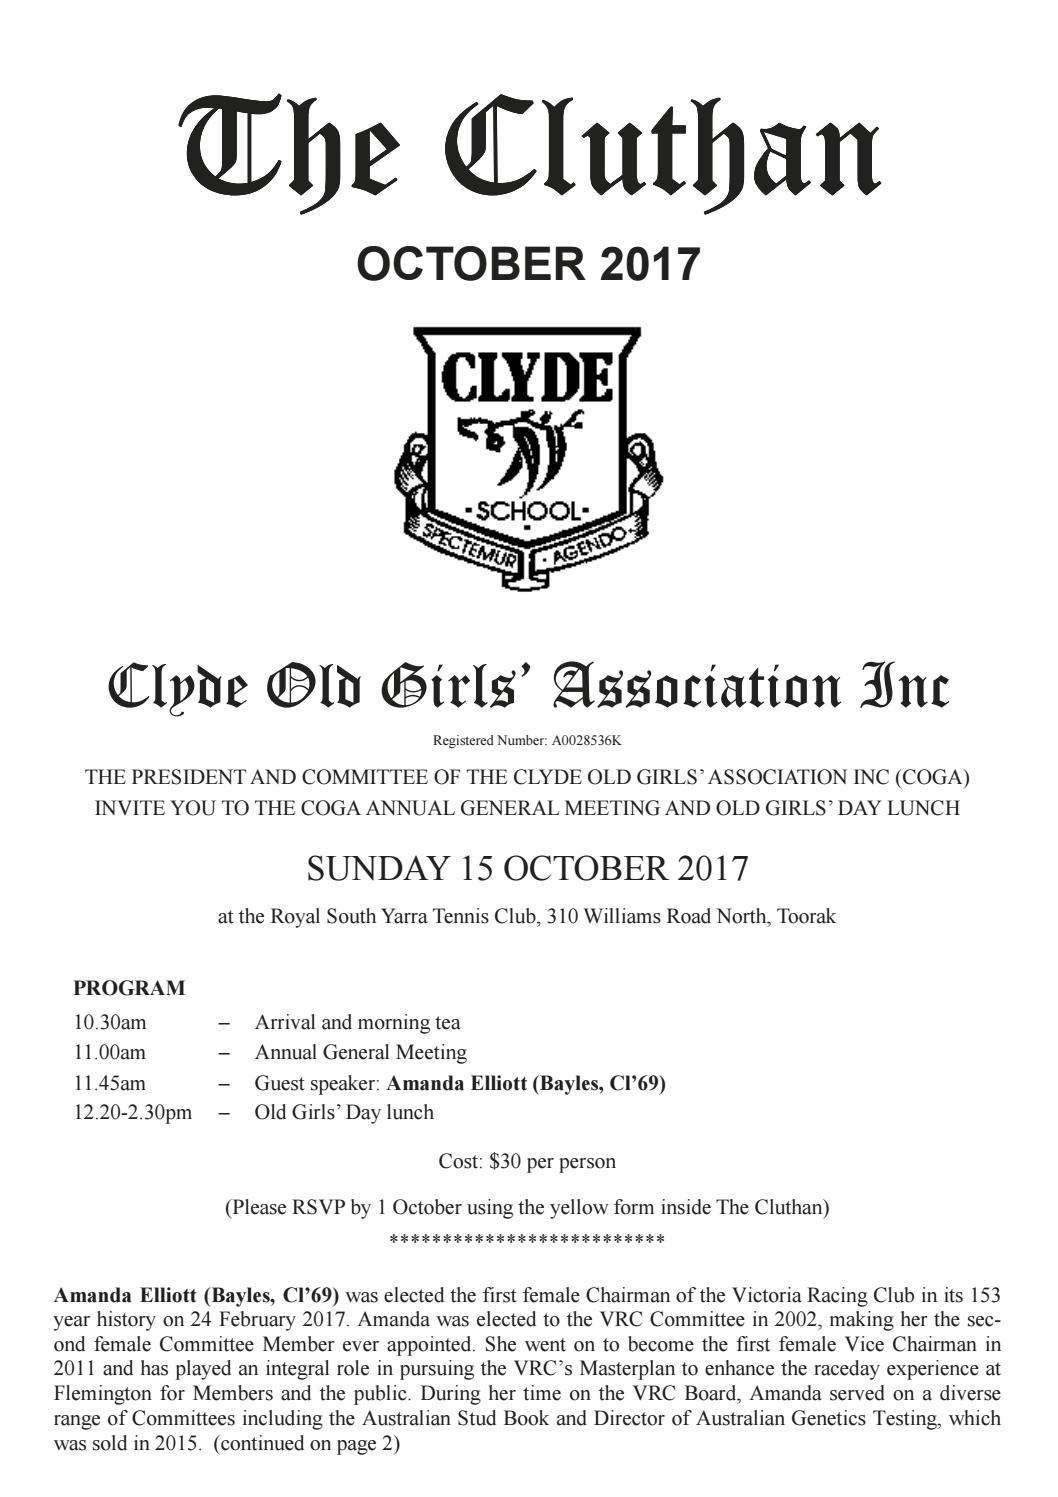 The Cluthan - 2017 Edition by Geelong Grammar School - issuu